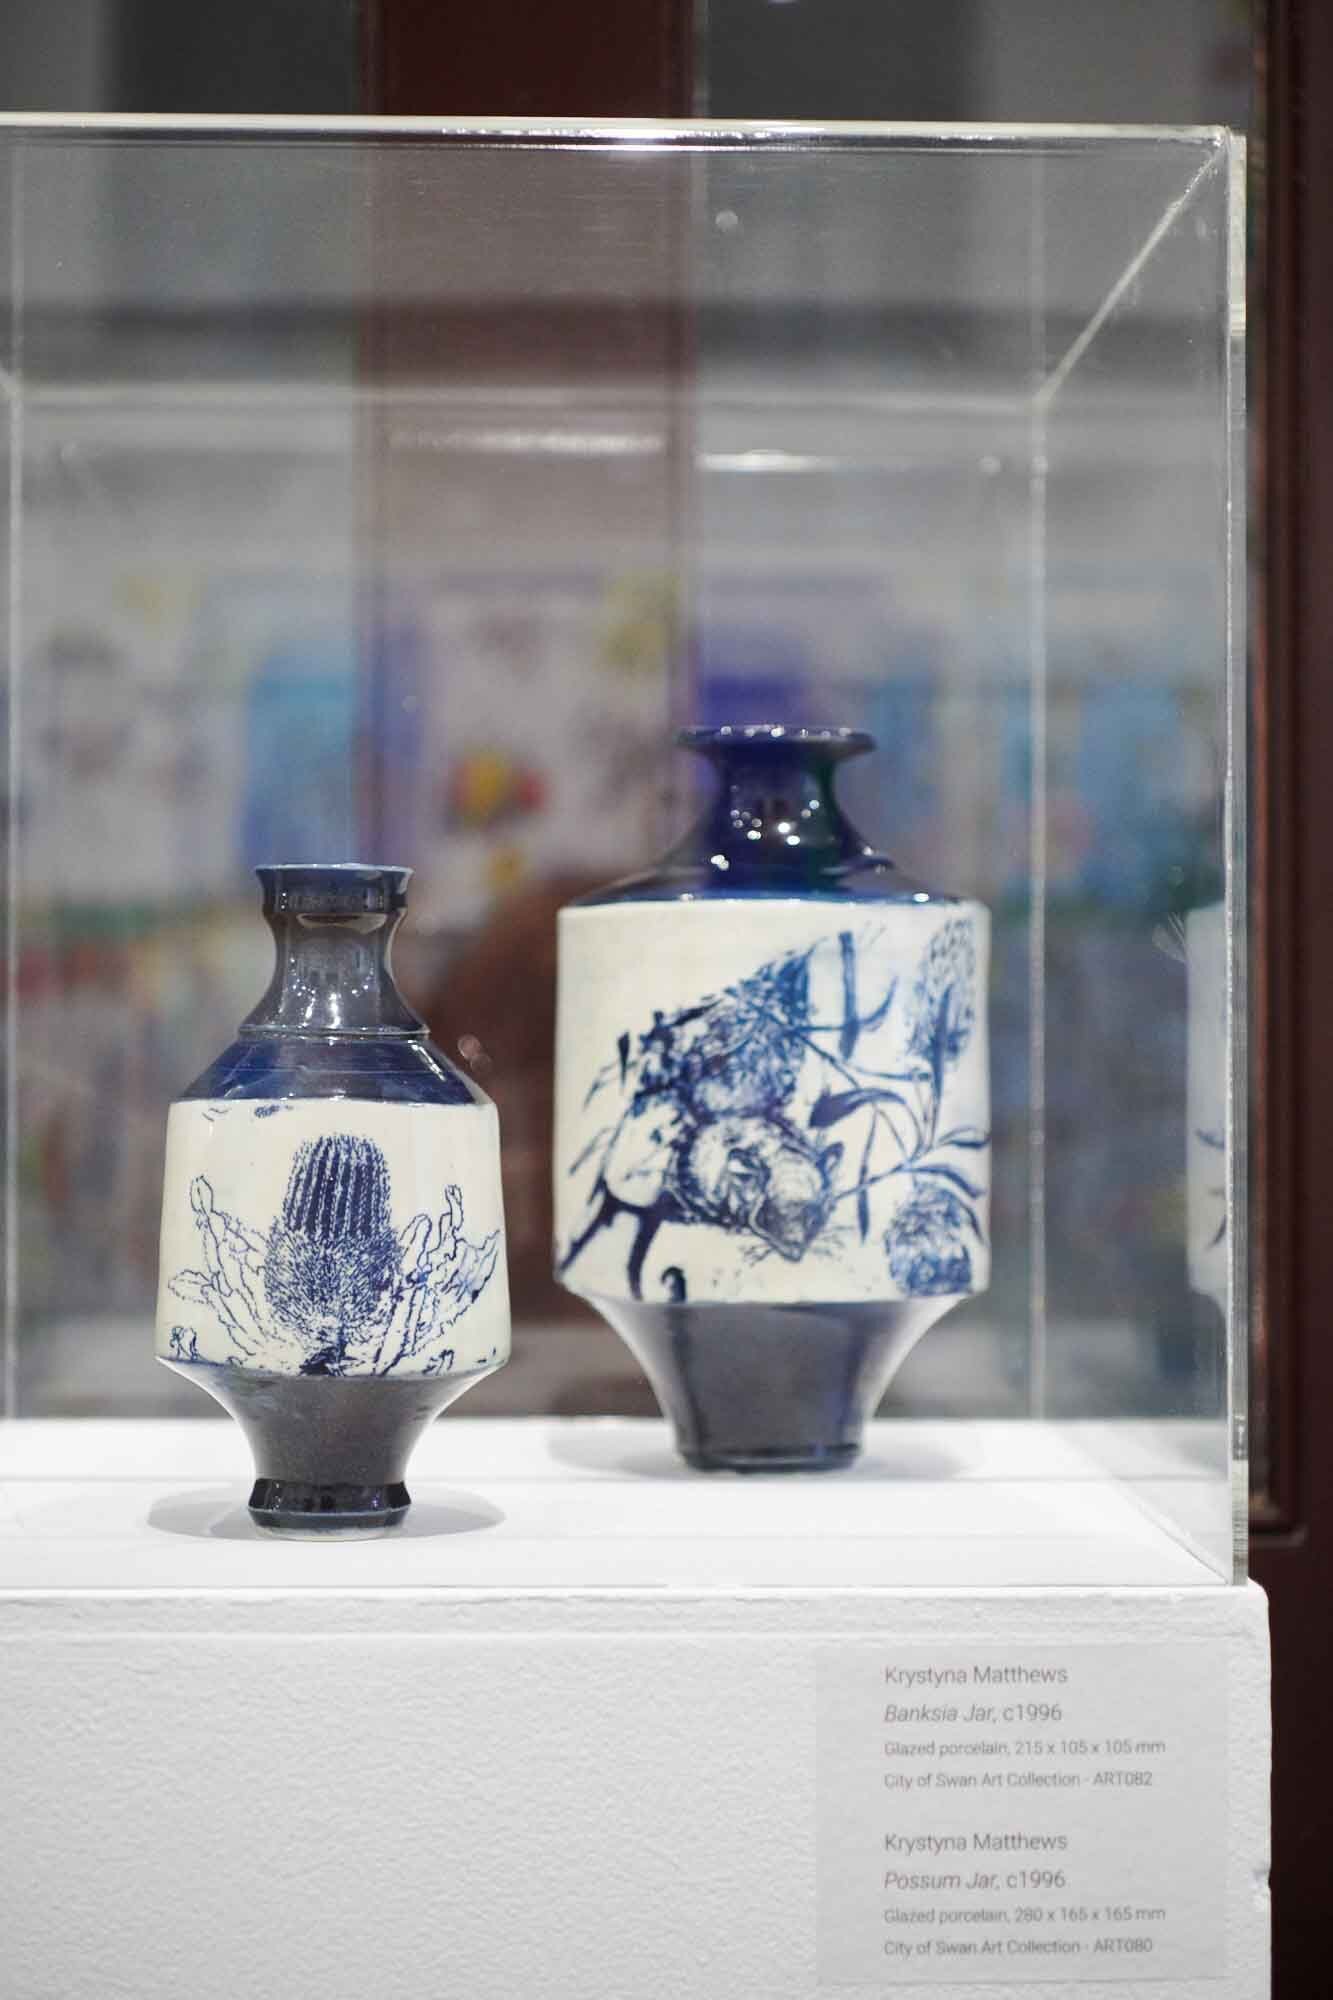 Krystyna Matthews, Banksia Jar and Possum Jar, 1996, glazed porcelain. Image by Rebecca Mansell.